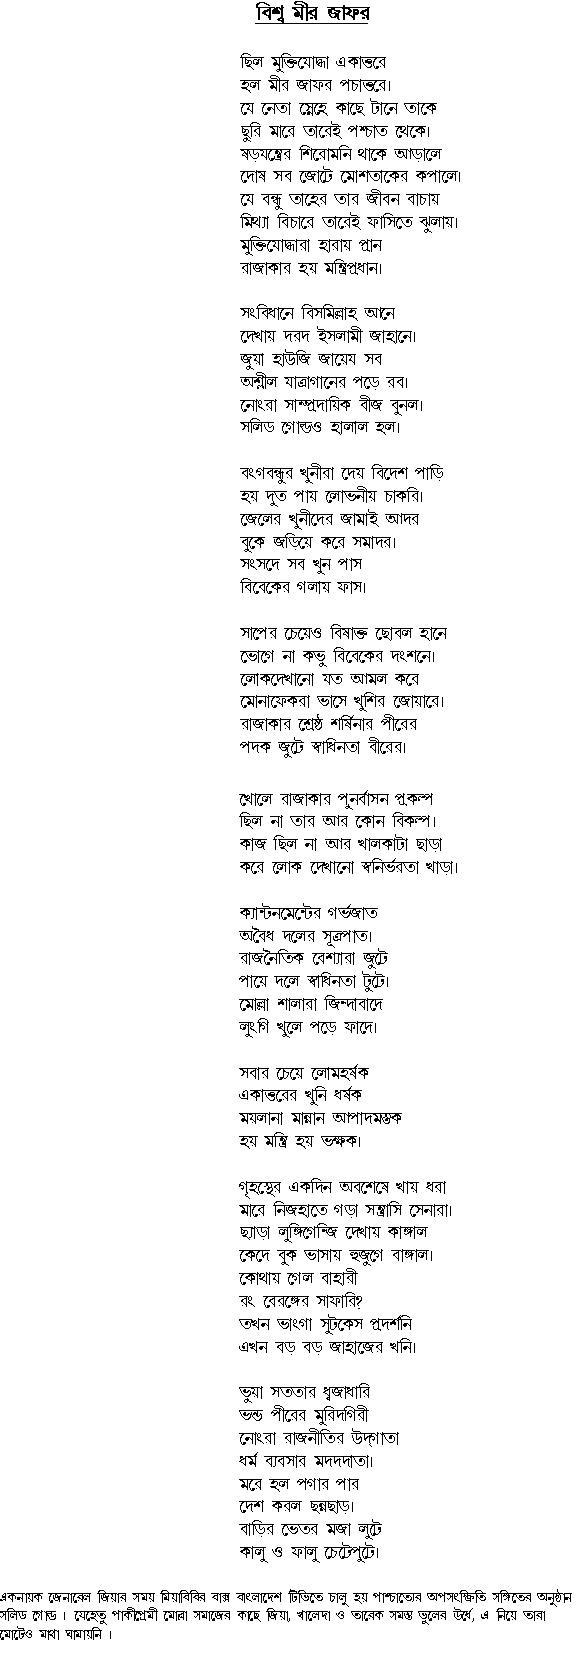 Some Interesting Poems